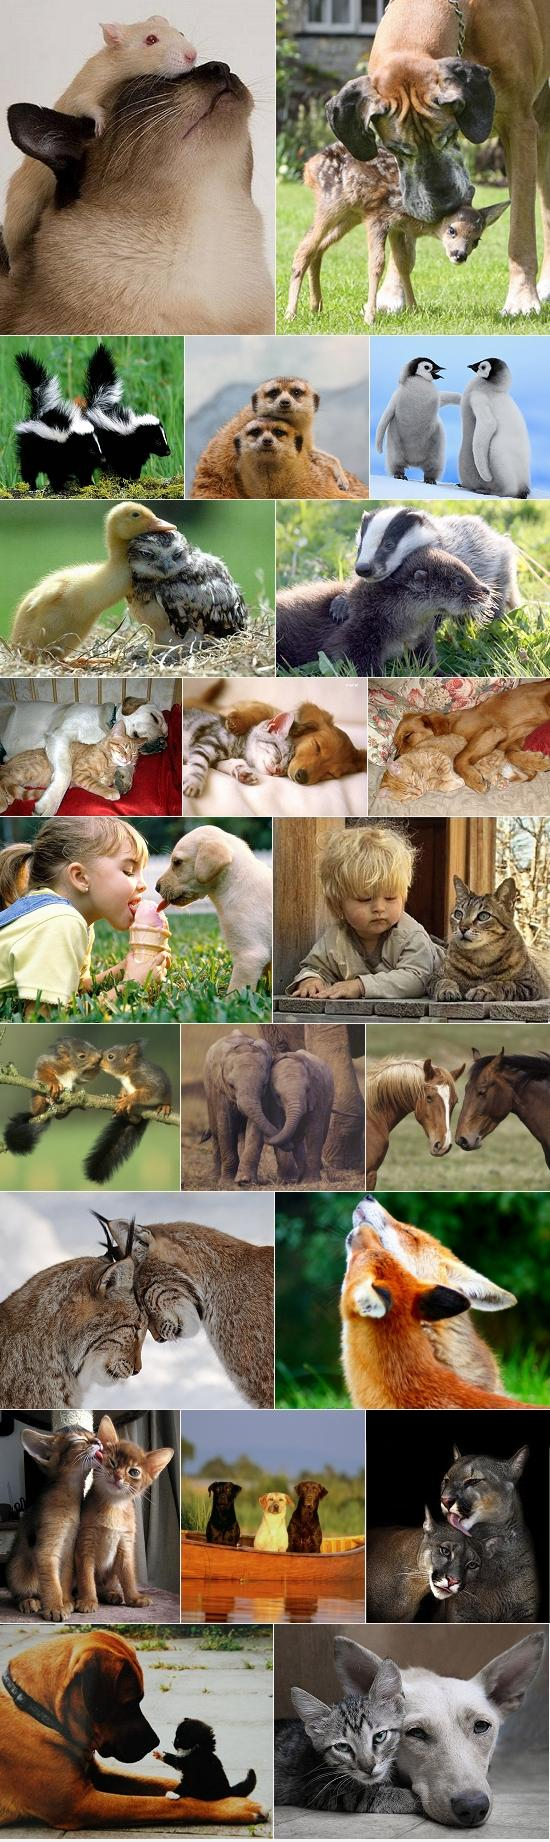 Friendship transcends species